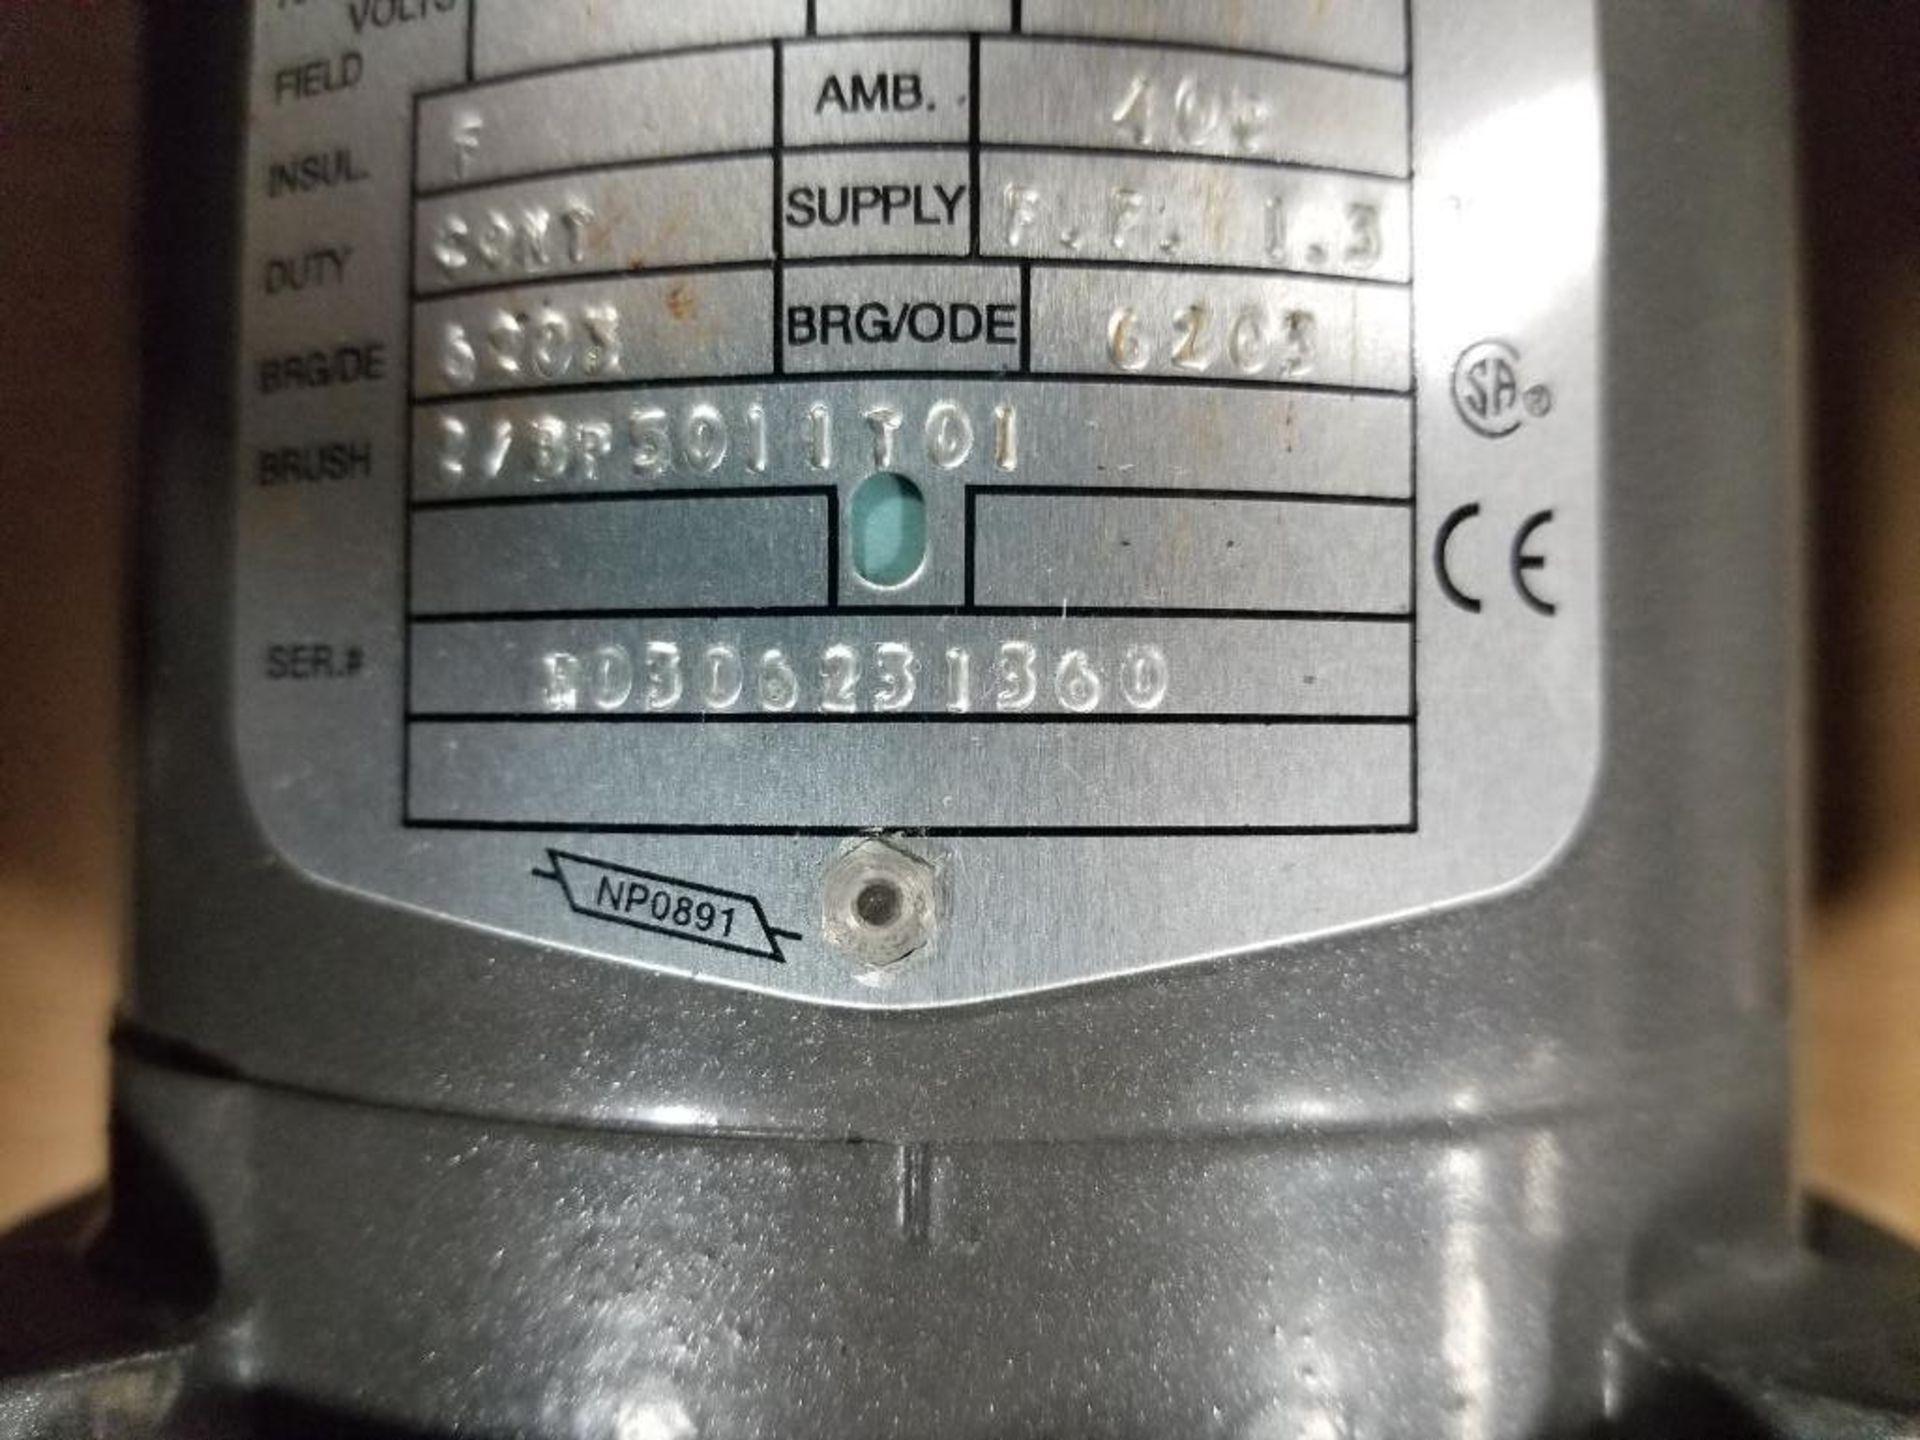 1/2HP Baldor industrial motor COP3330, 33-2024Z122. 1750RPM, 56C-Frame. - Image 4 of 6